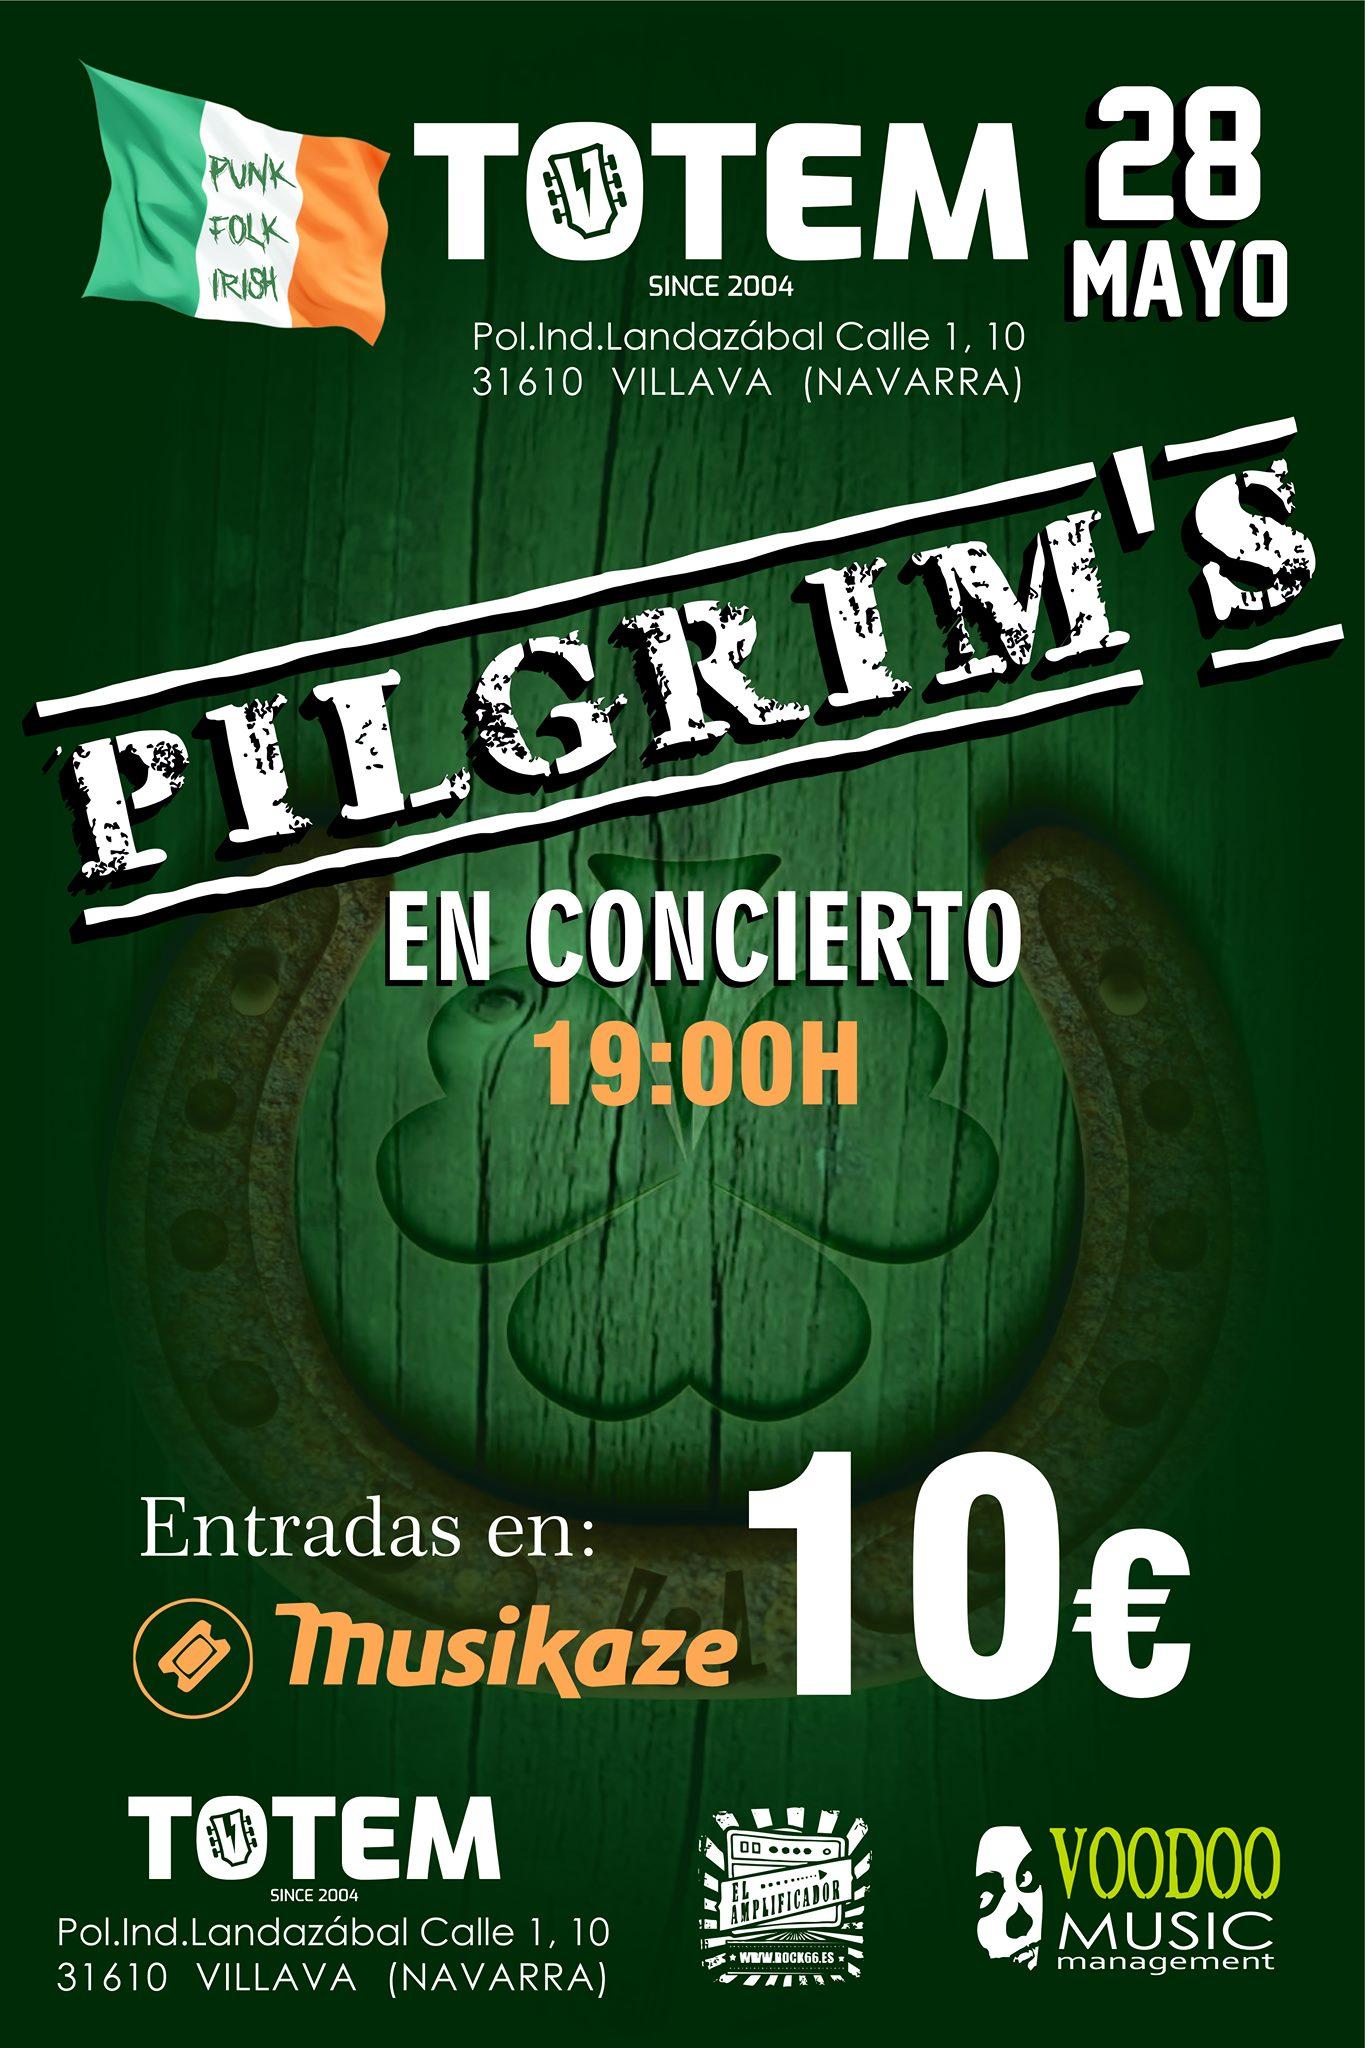 Pilgrim's – 28 de mayo en Sala Totem de Villaba (Navarra)